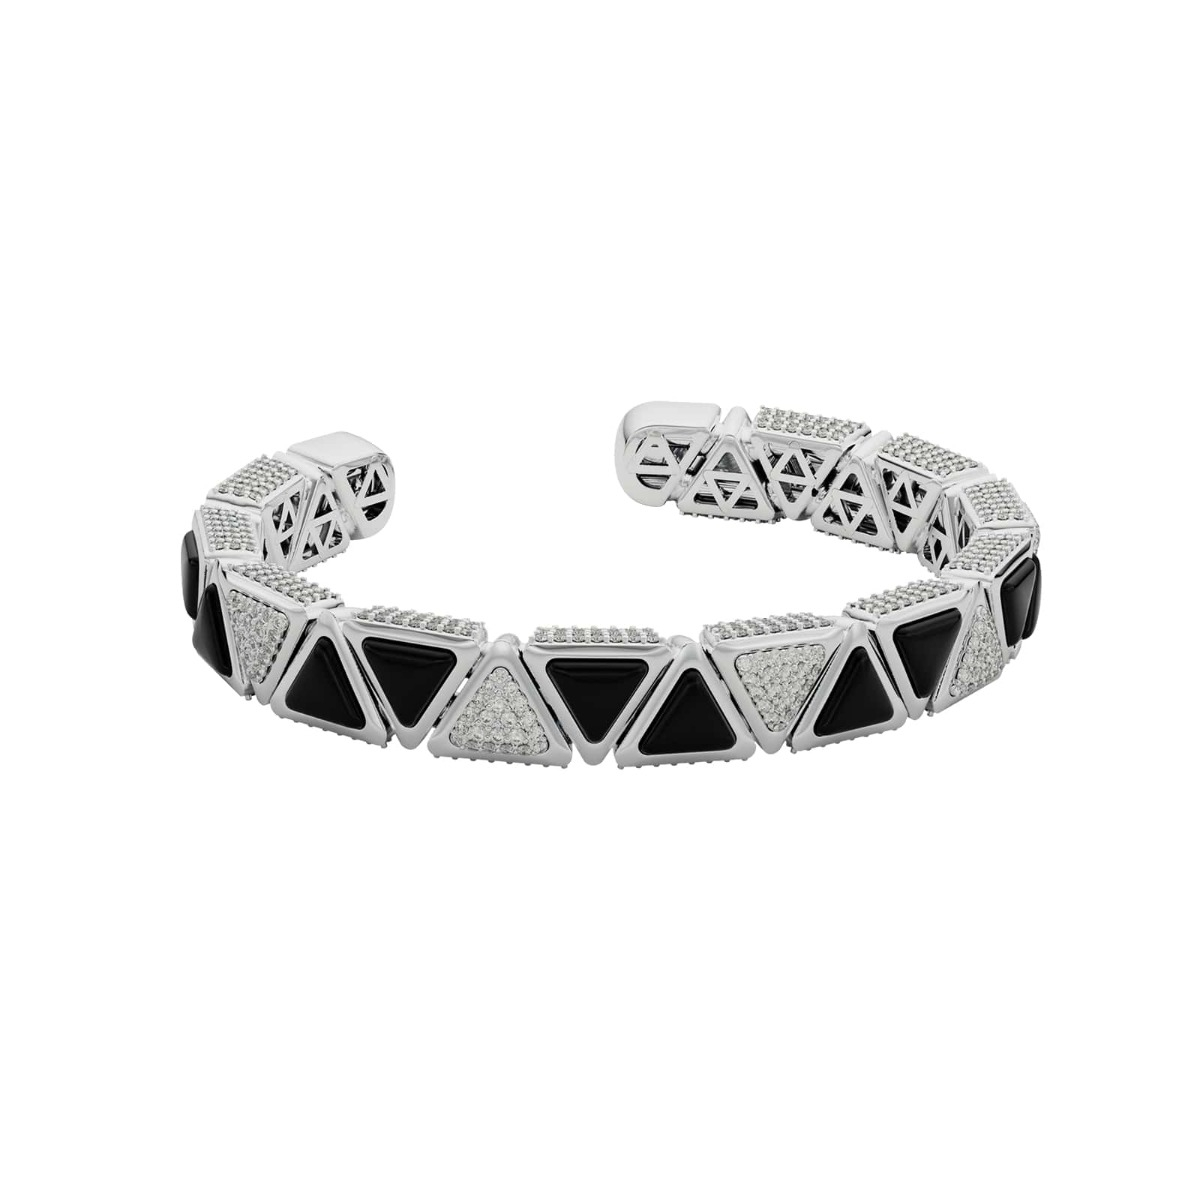 Bracelet BB Mirror Exquisite White Gold Onix and Diamonds